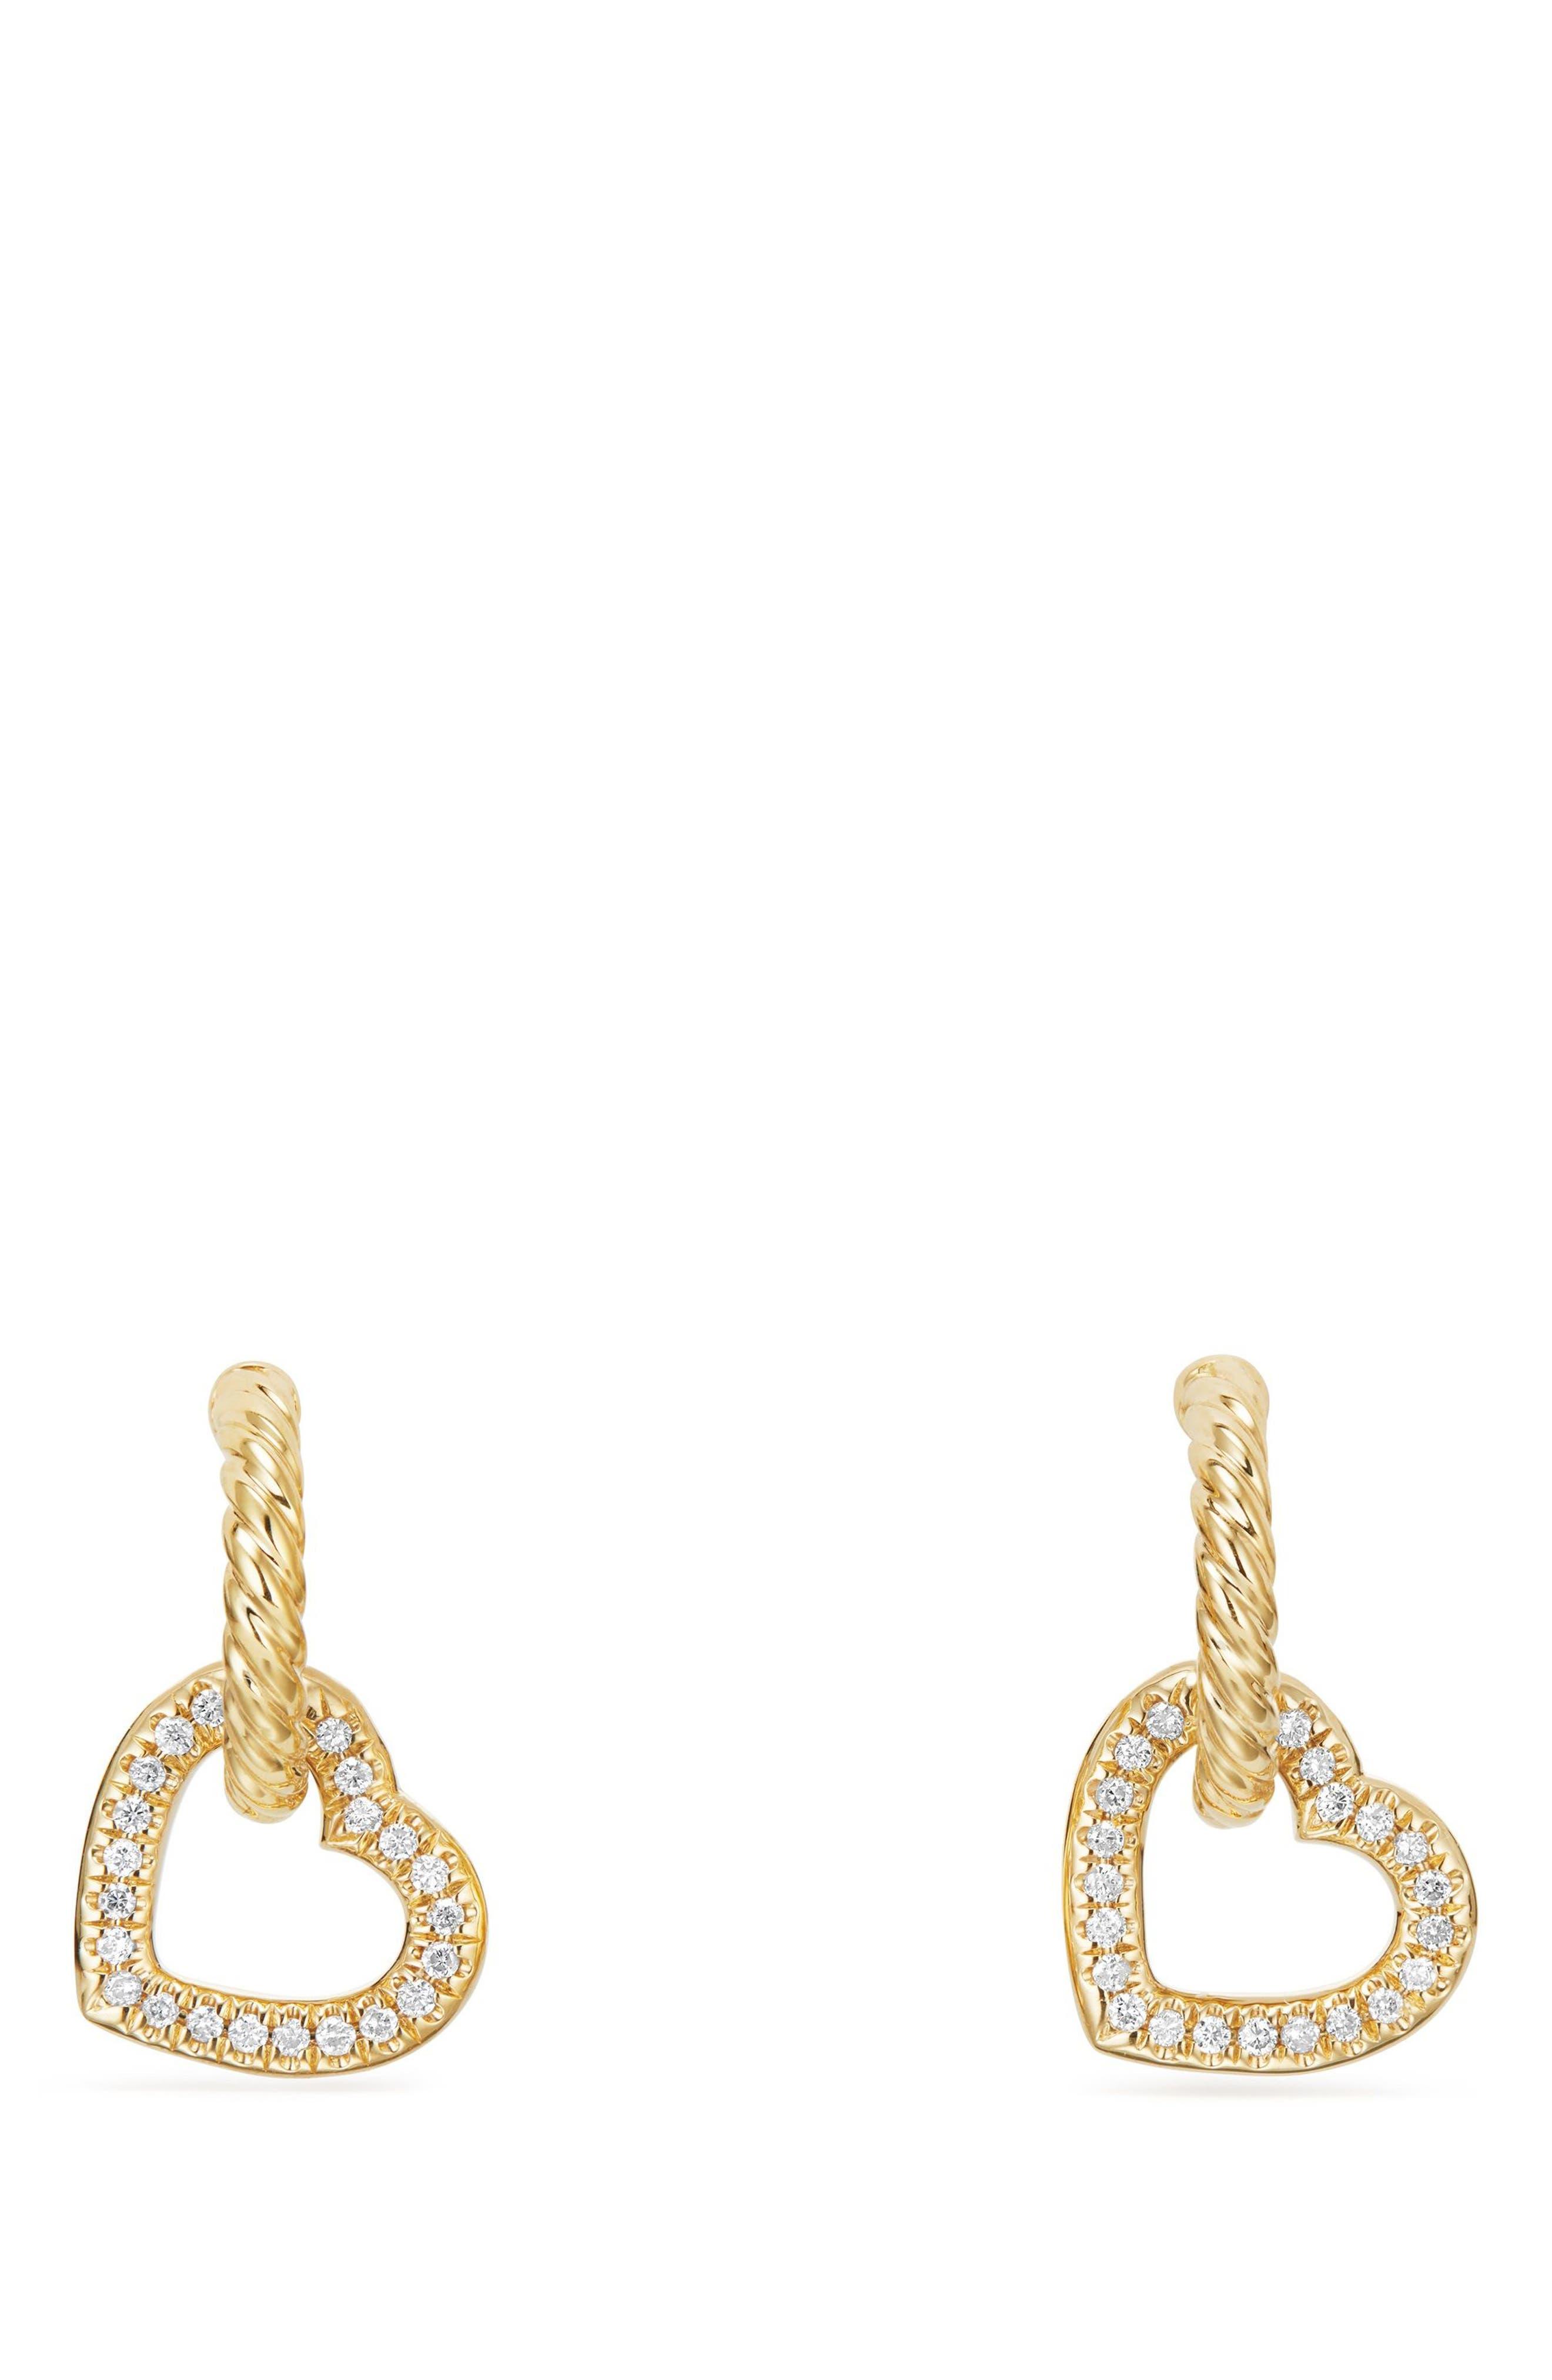 DAVID YURMAN, Heart Drop Earrings with Diamonds in 18K Gold, Alternate thumbnail 2, color, GOLD